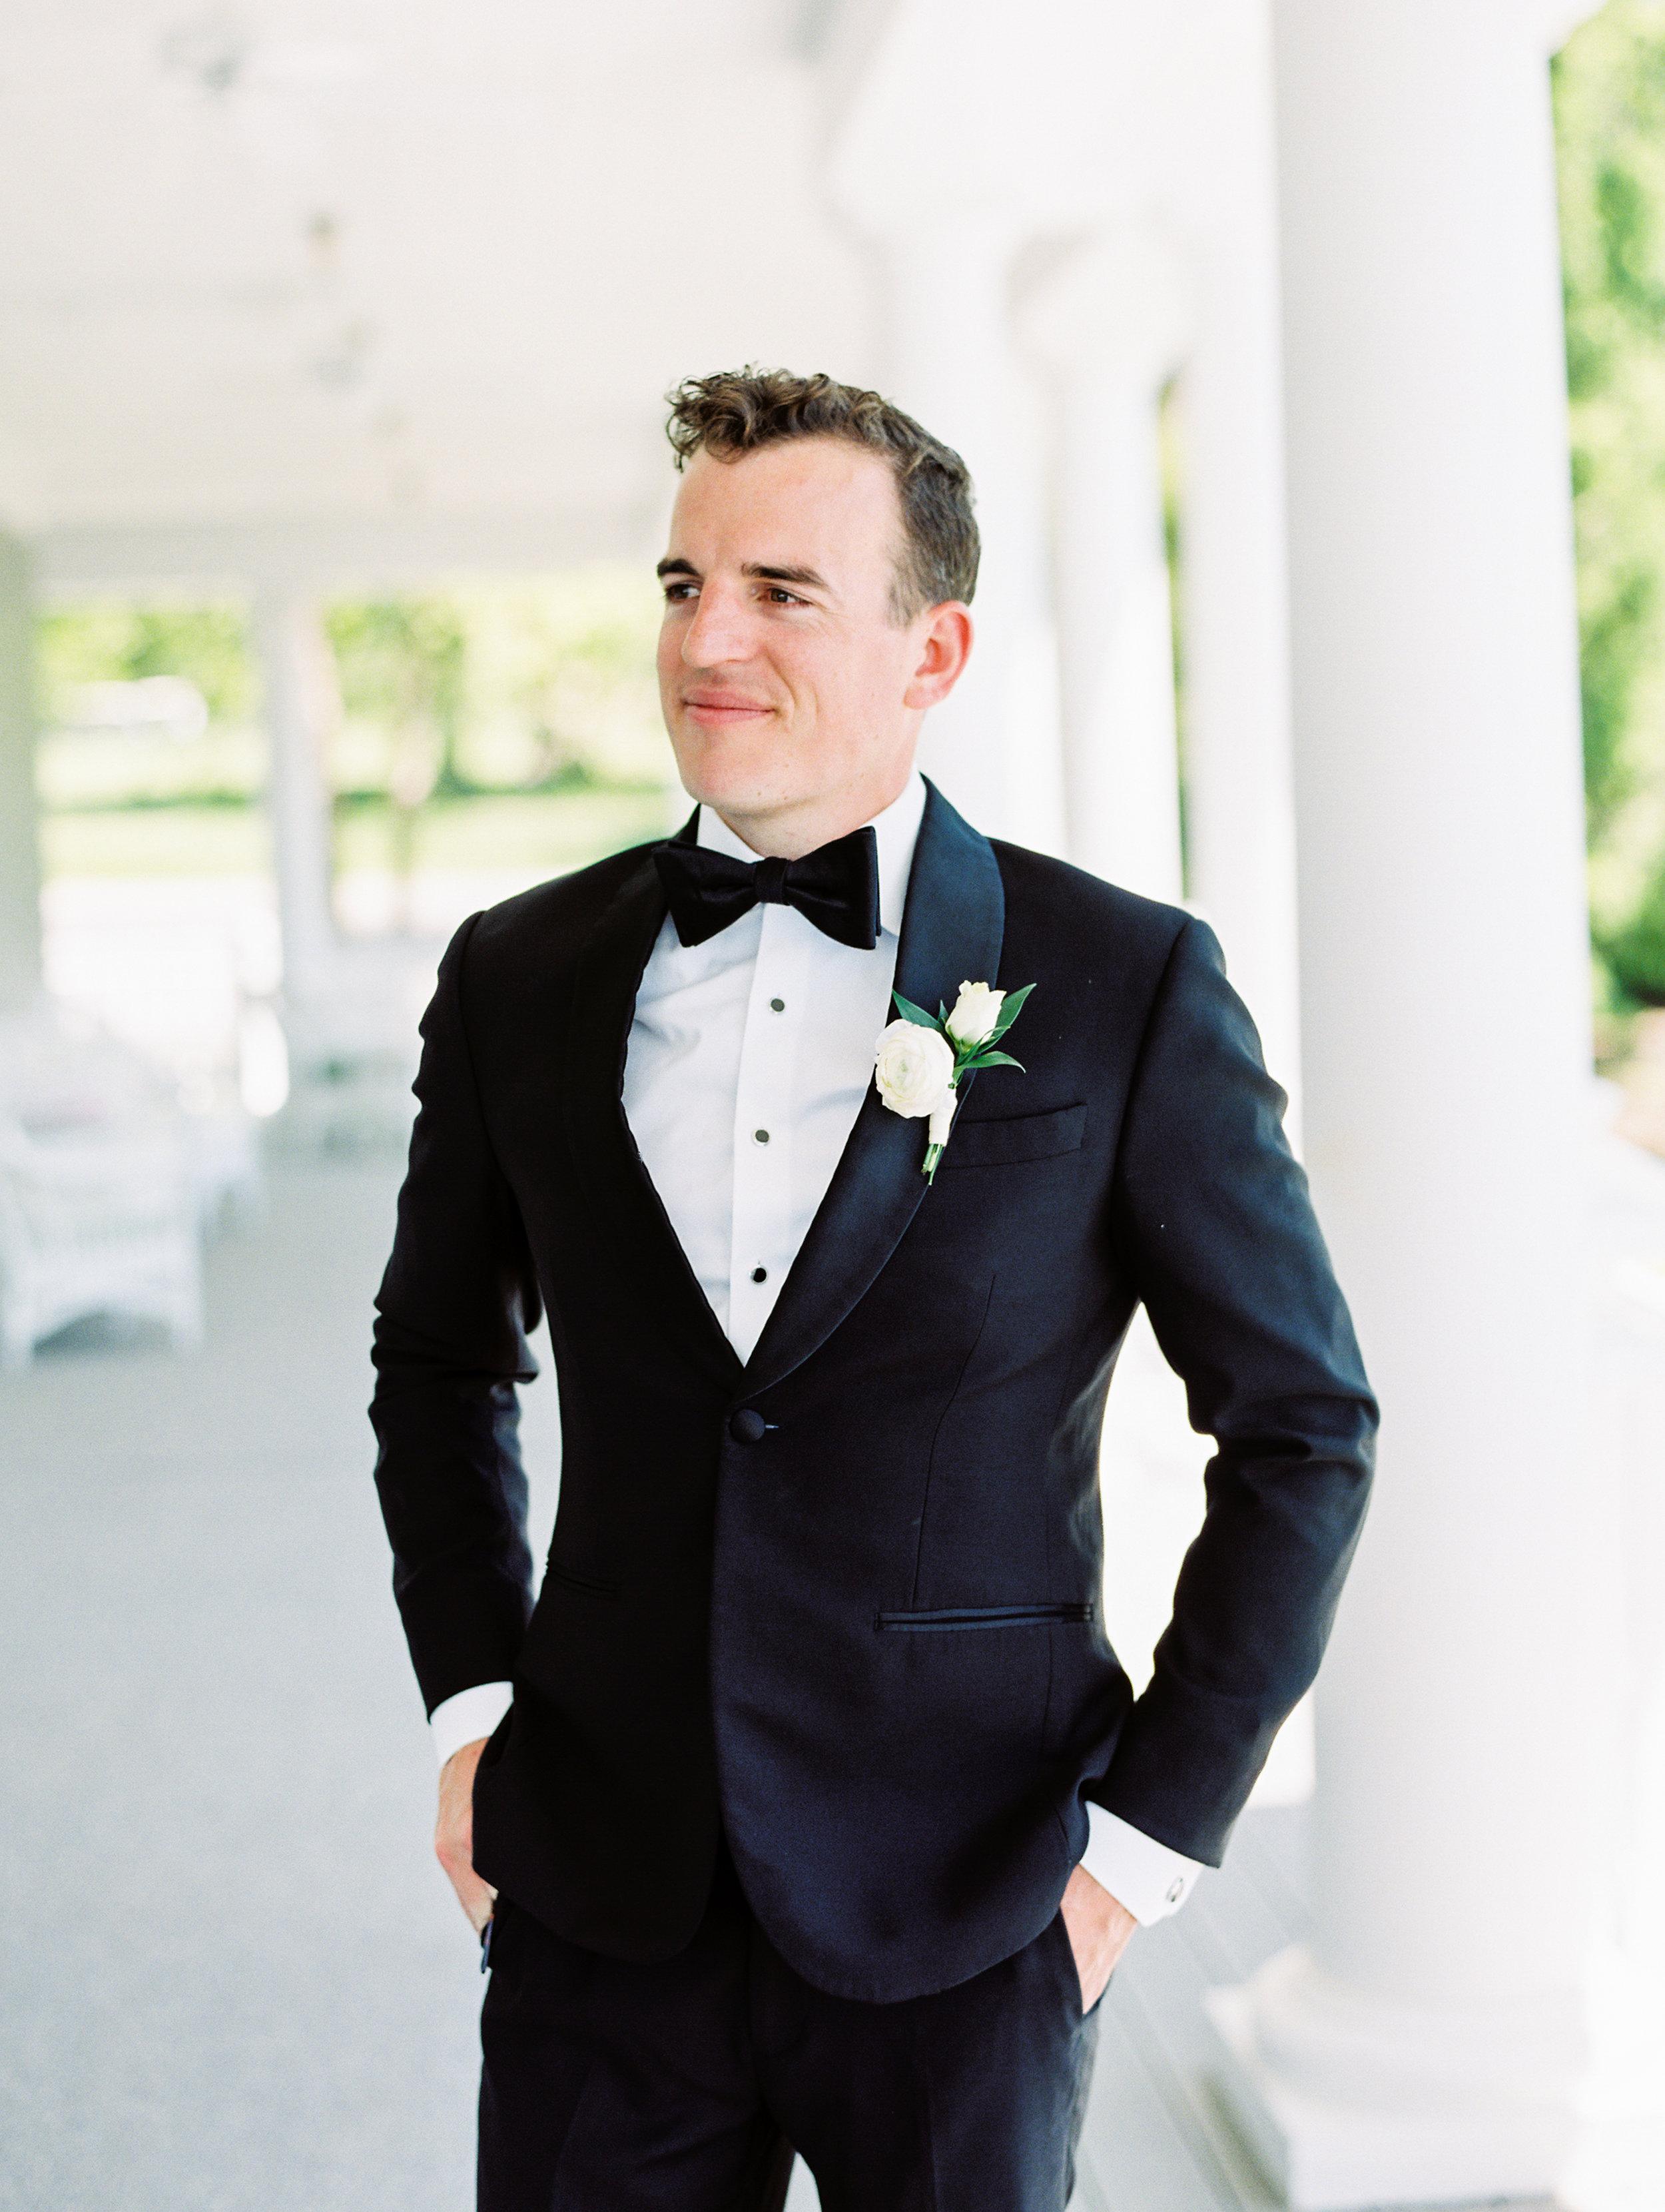 DeGuilio+Wedding+First+Lookf-16 copy.jpg